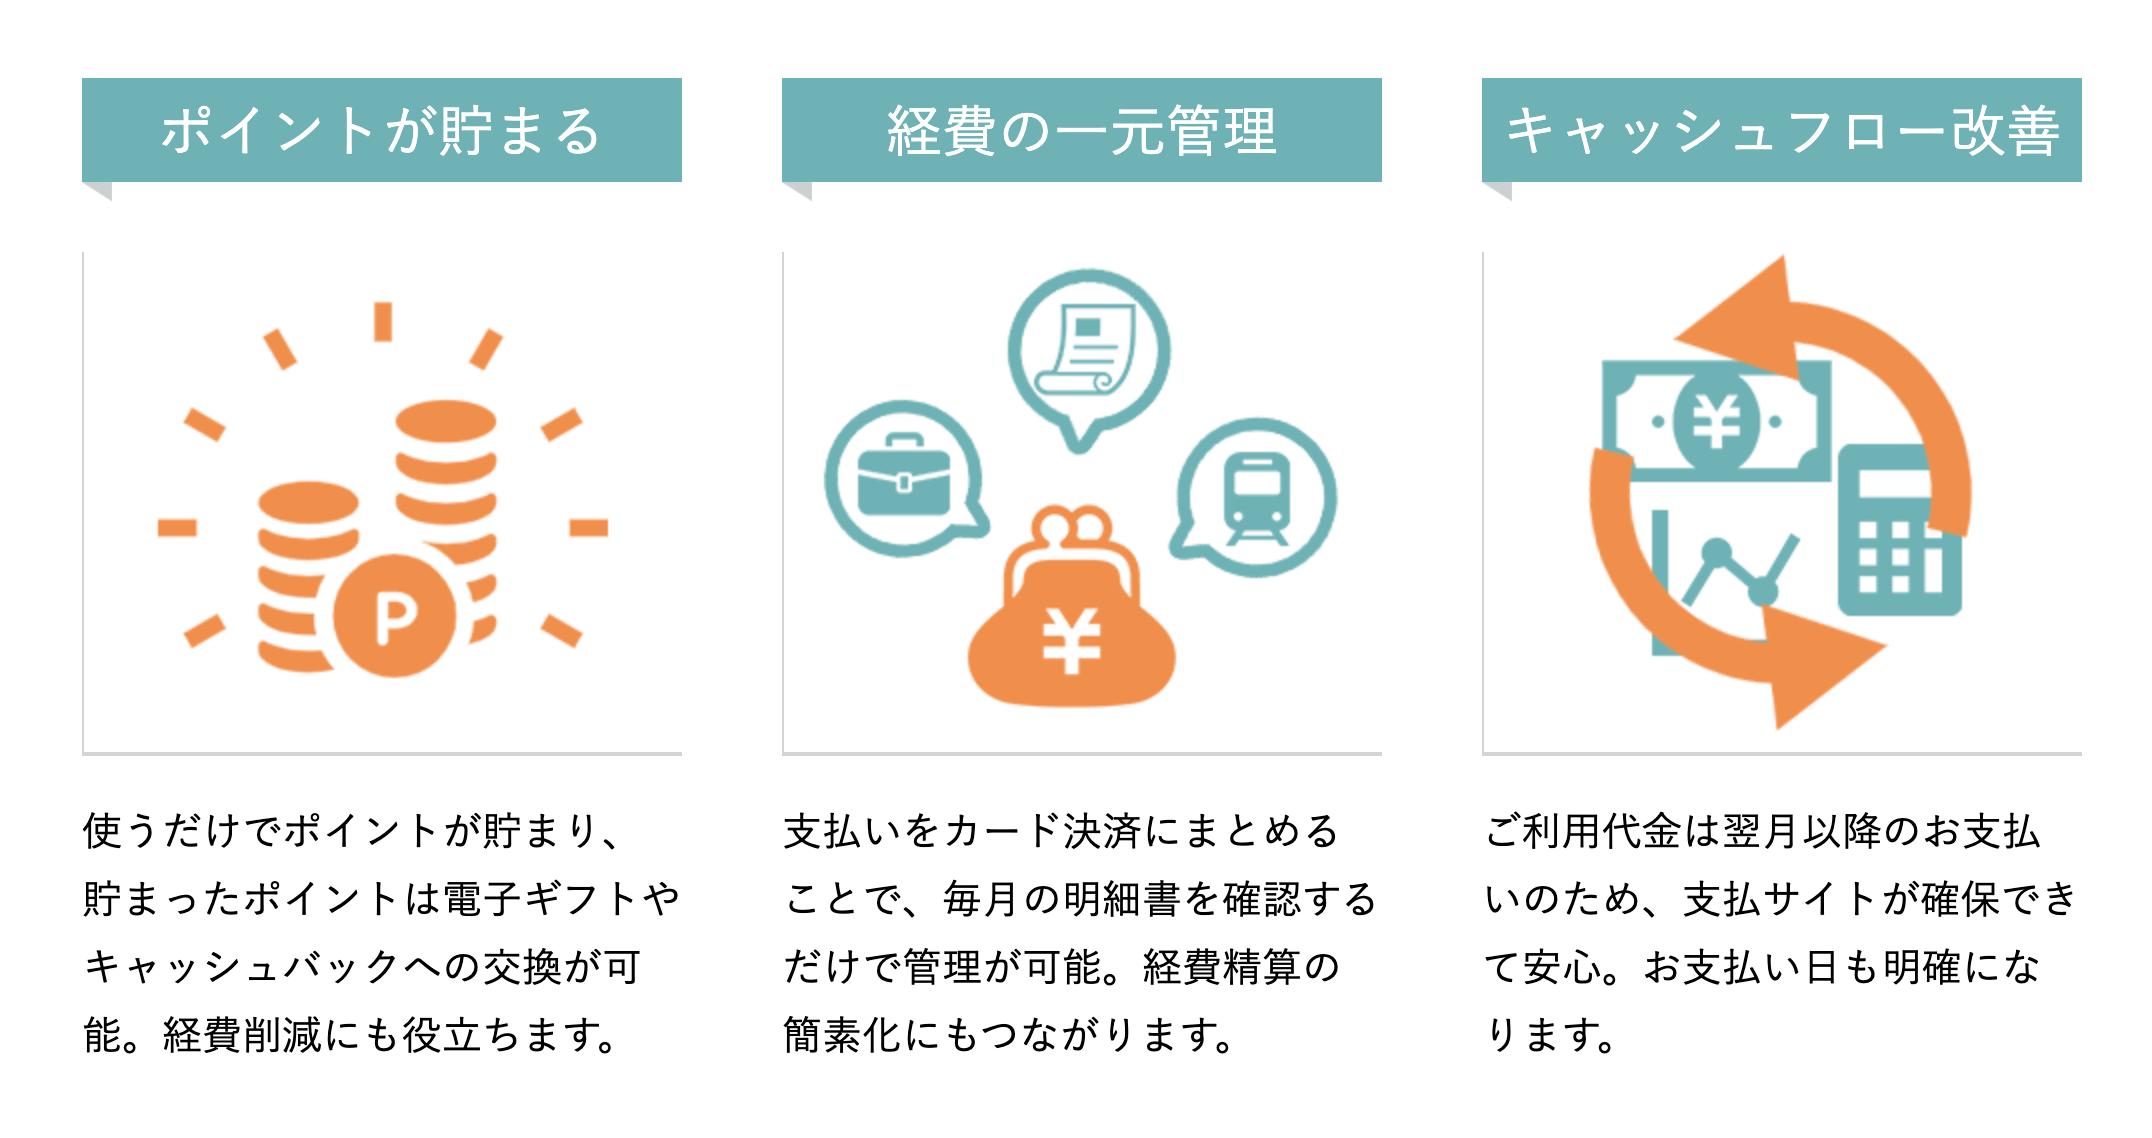 NTTファイナンスBizカードのサービスの特徴